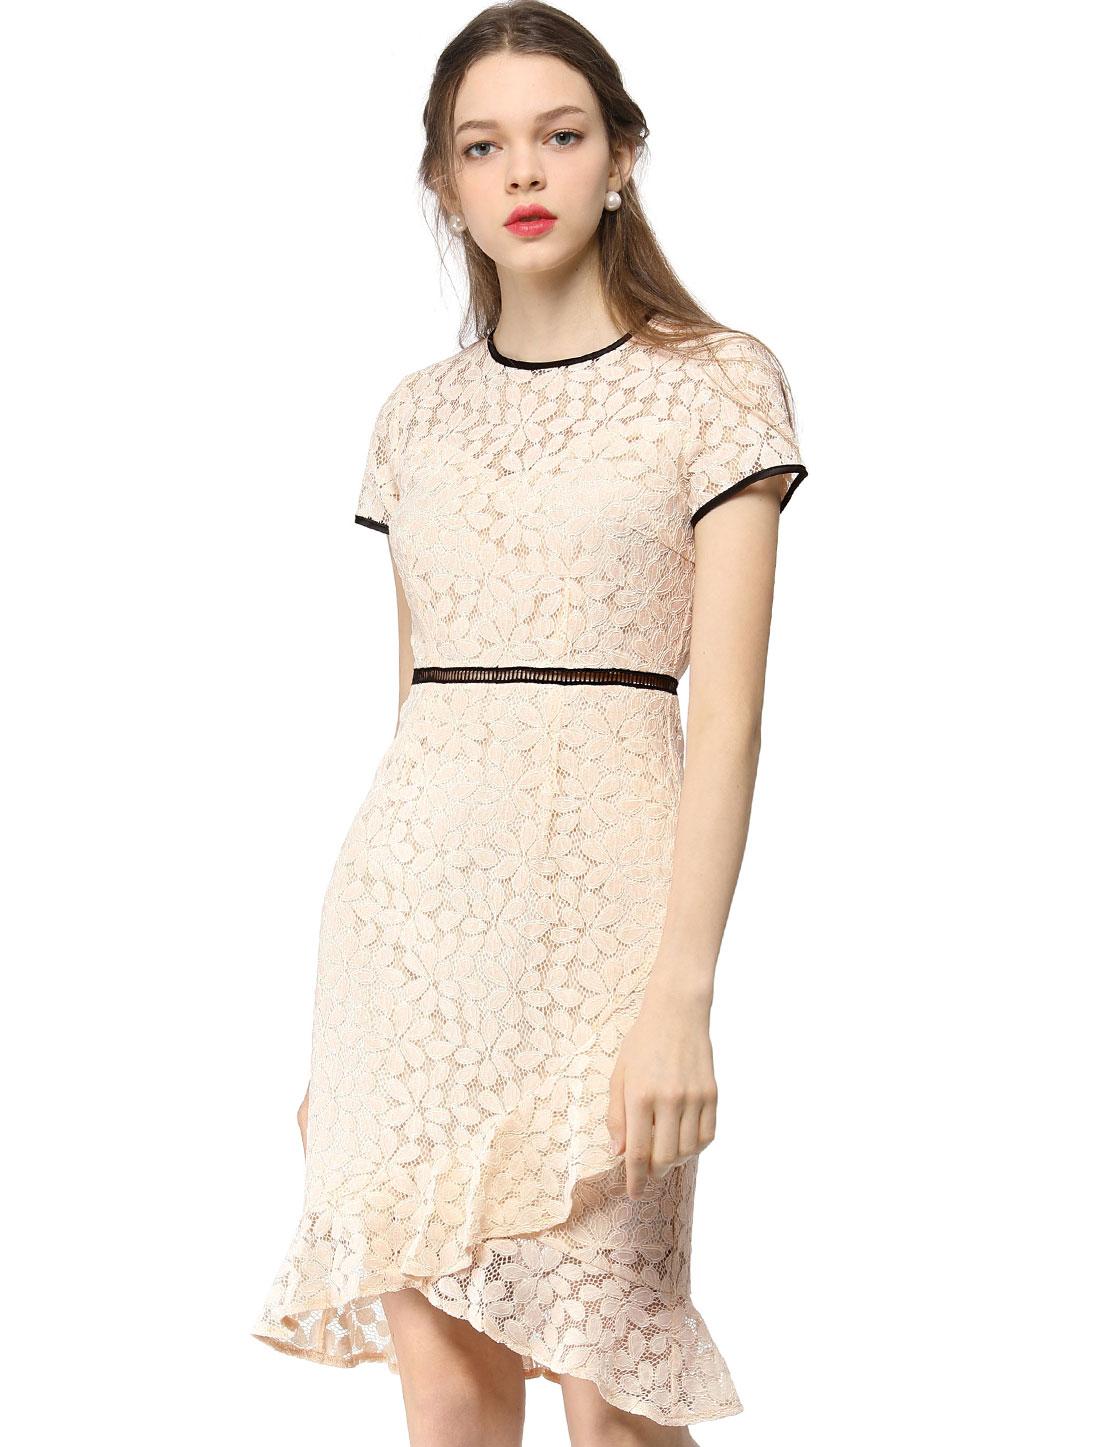 Women's Short Sleeve Contrast Trim Ruffled Floral Lace Dress Beige XS